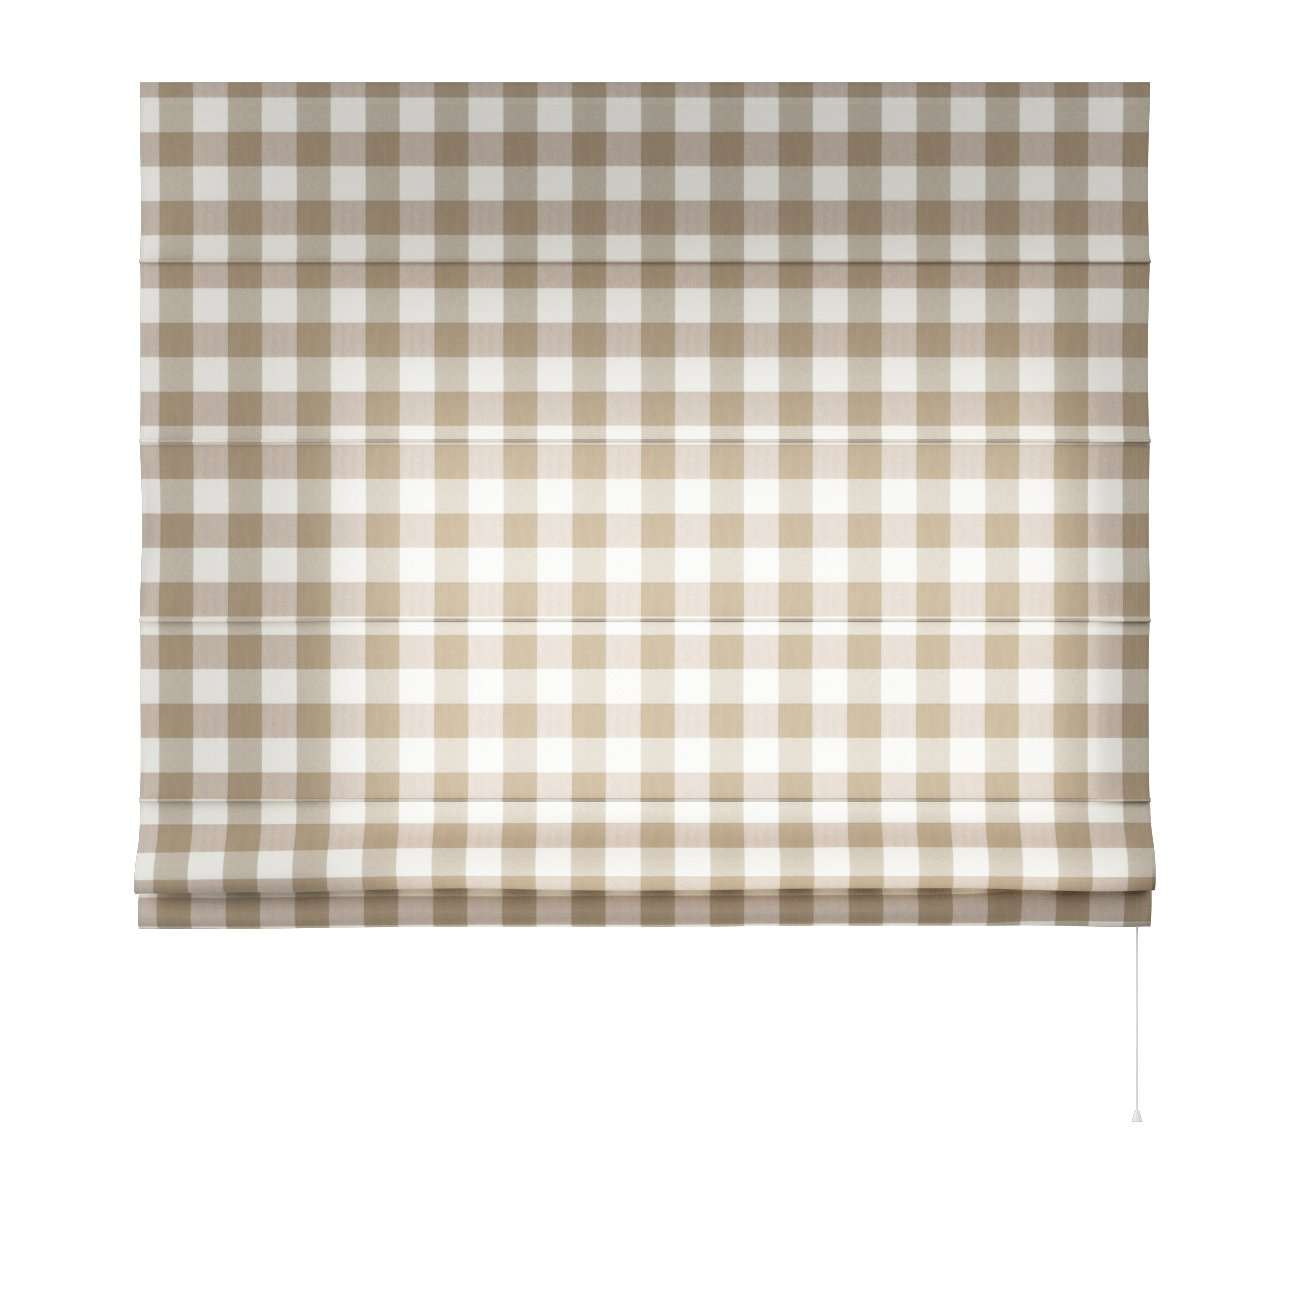 Capri roman blind in collection Quadro, fabric: 136-08